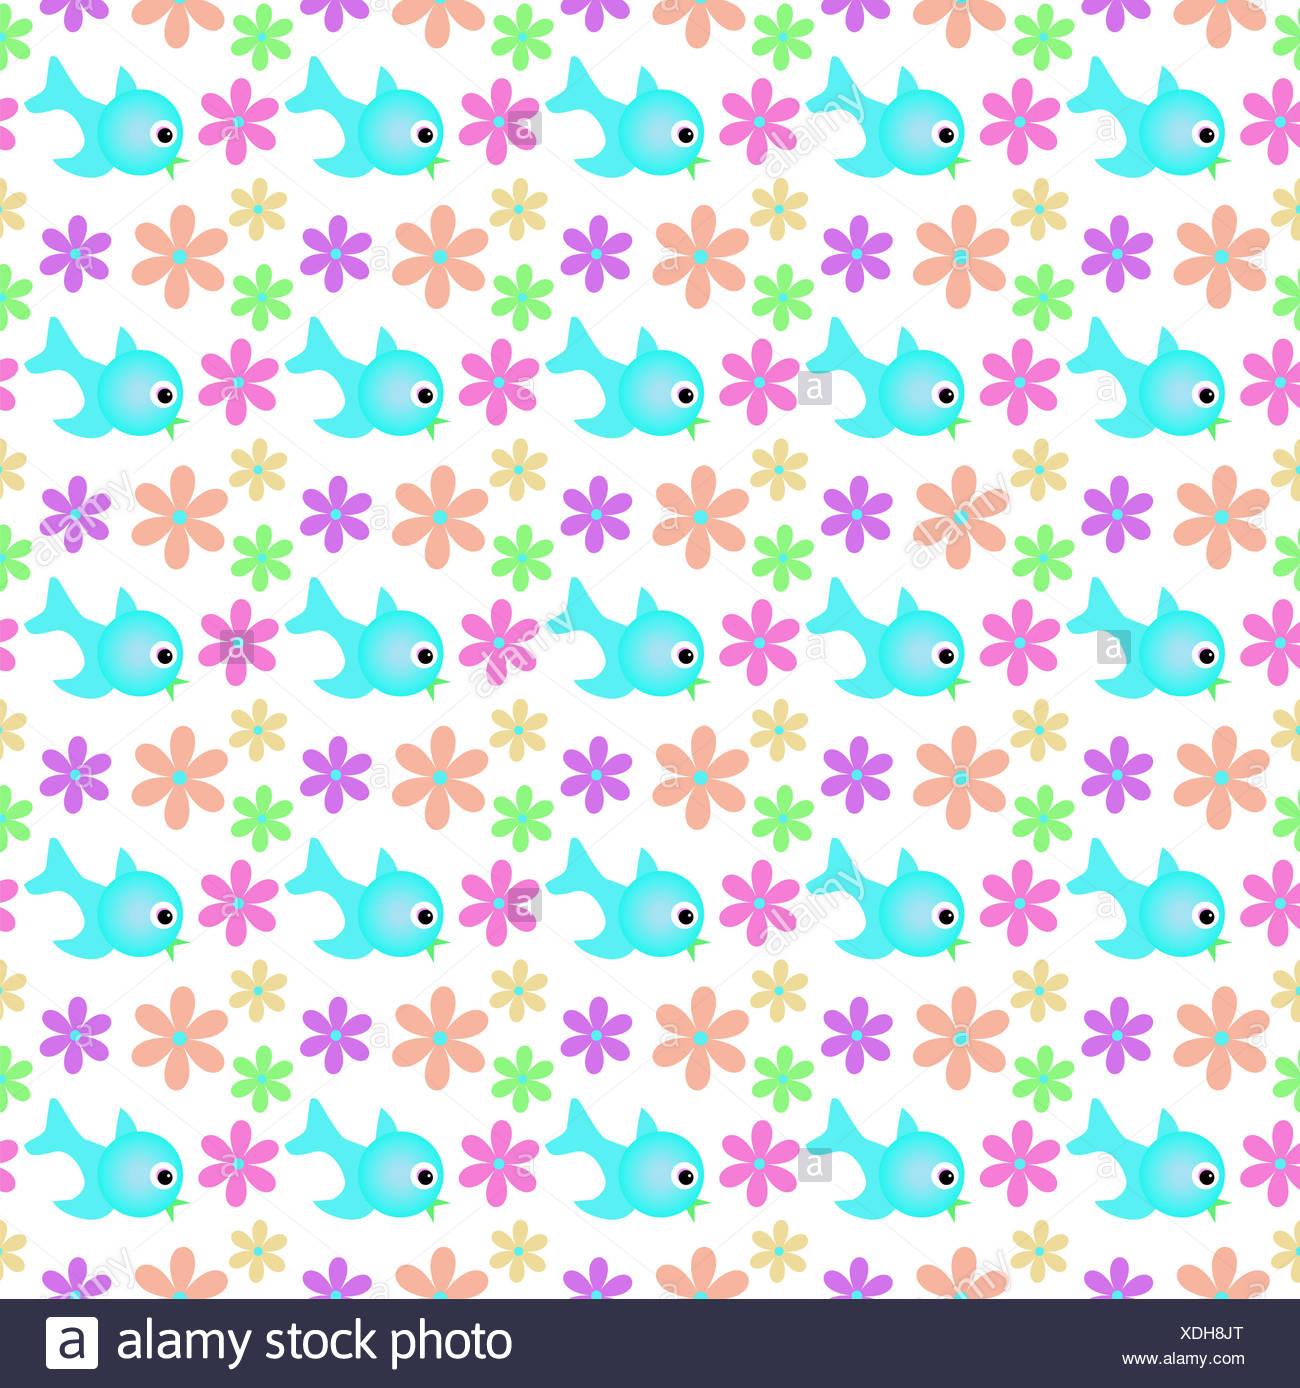 bird flower plant decorative birdie maddening pert coquettish cute backdrop - Stock Image